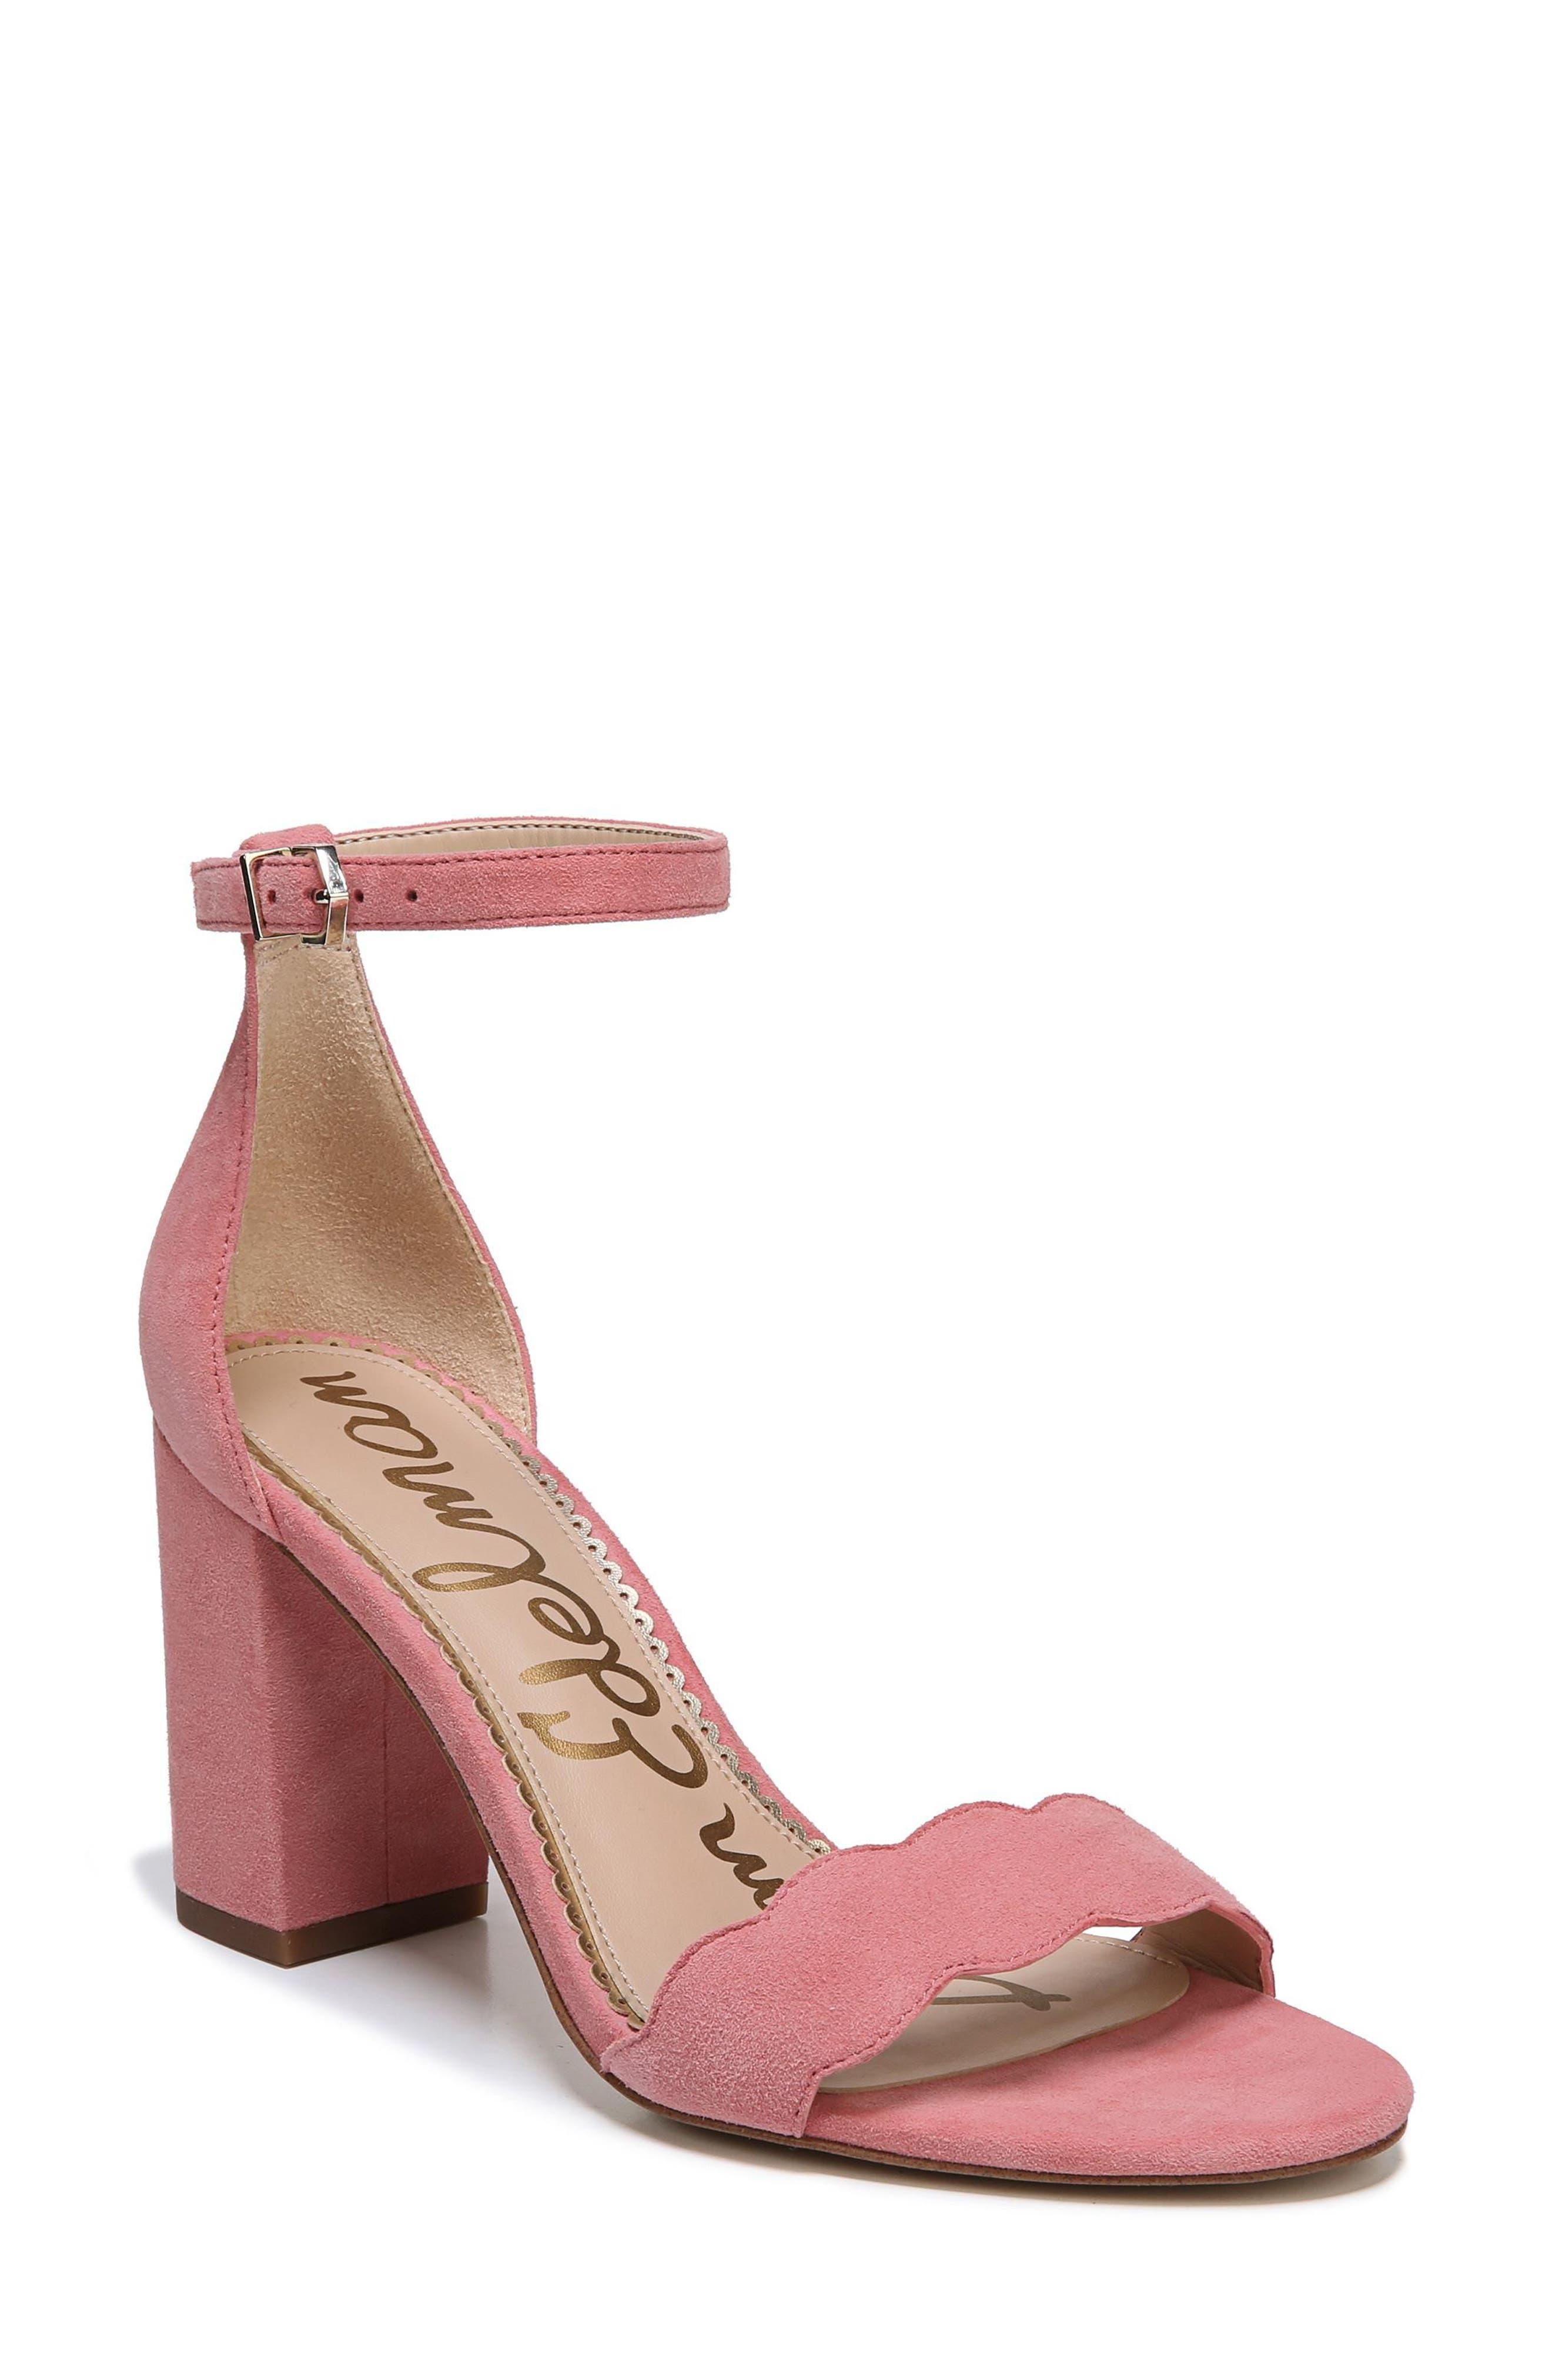 Odila Sandal,                         Main,                         color, Pink Lemonade Suede